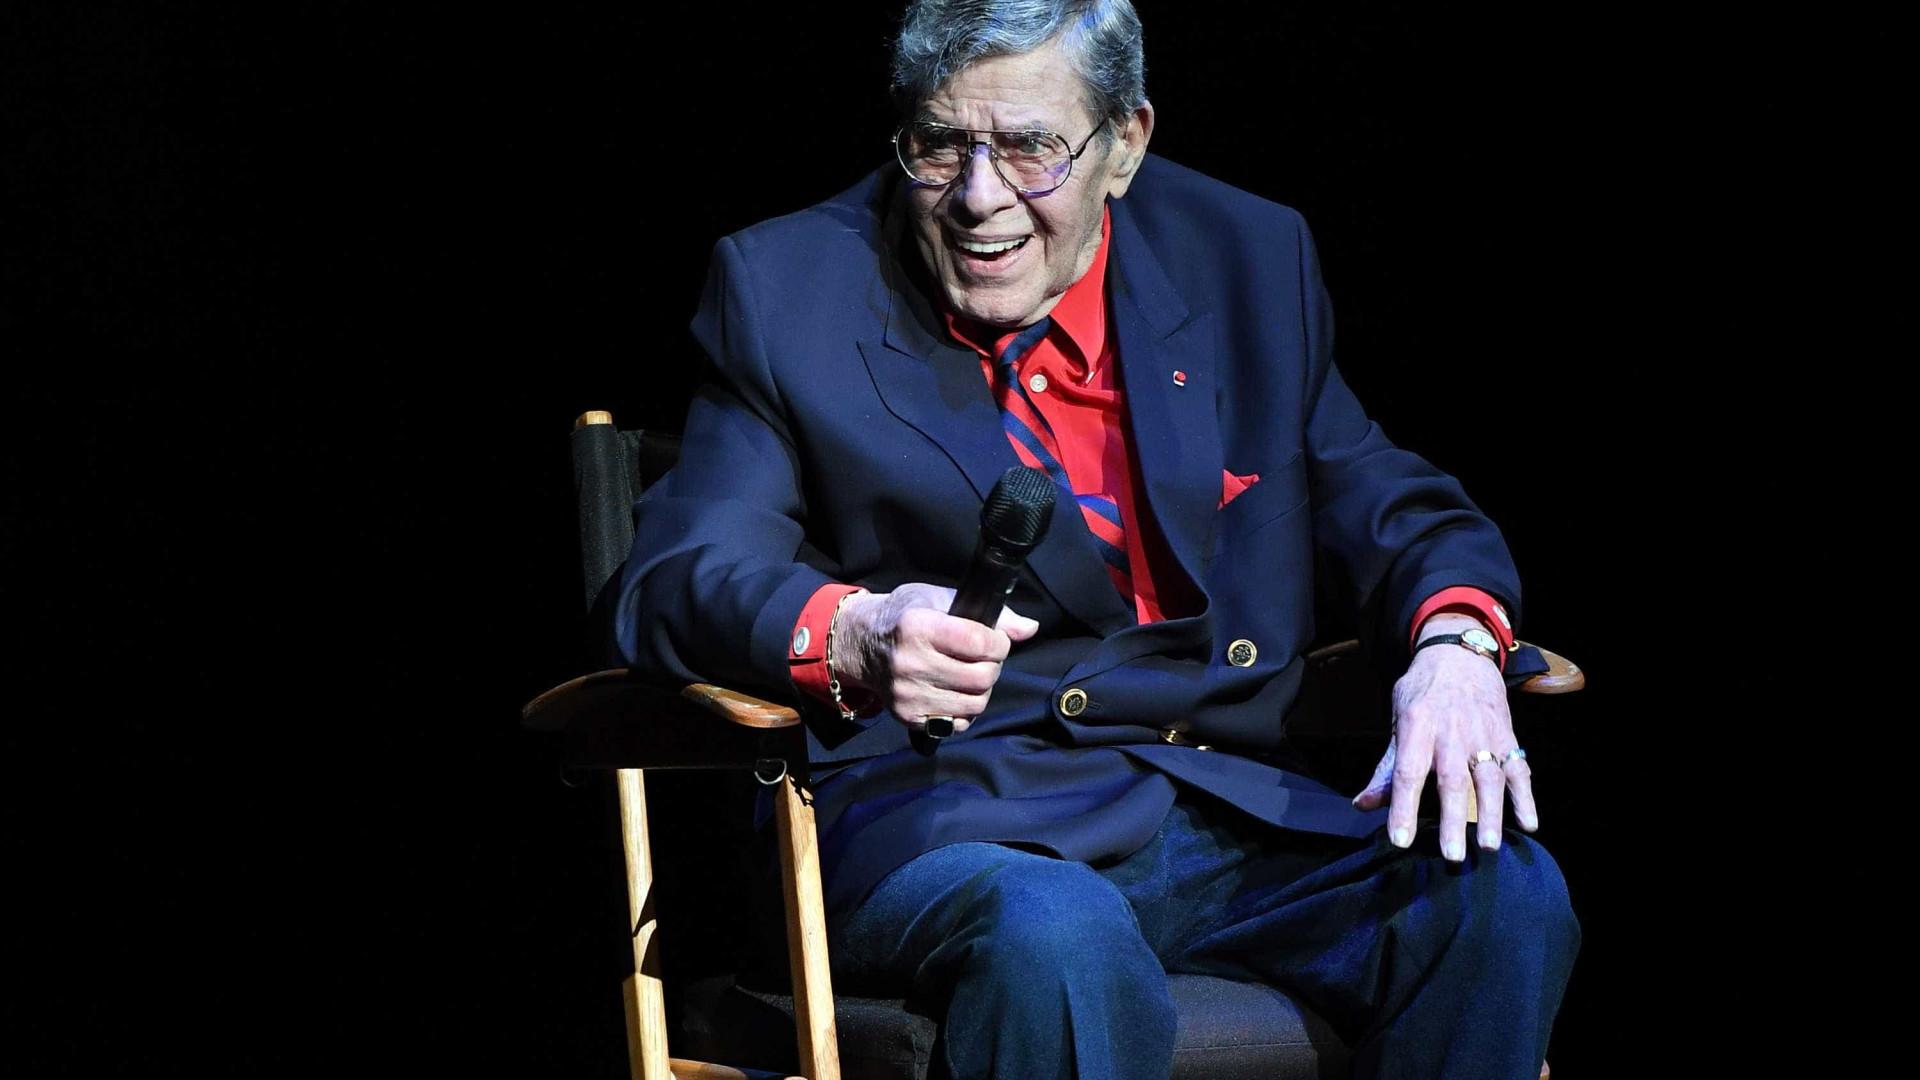 Morreu aos 91 anos o humorista Jerry Lewis